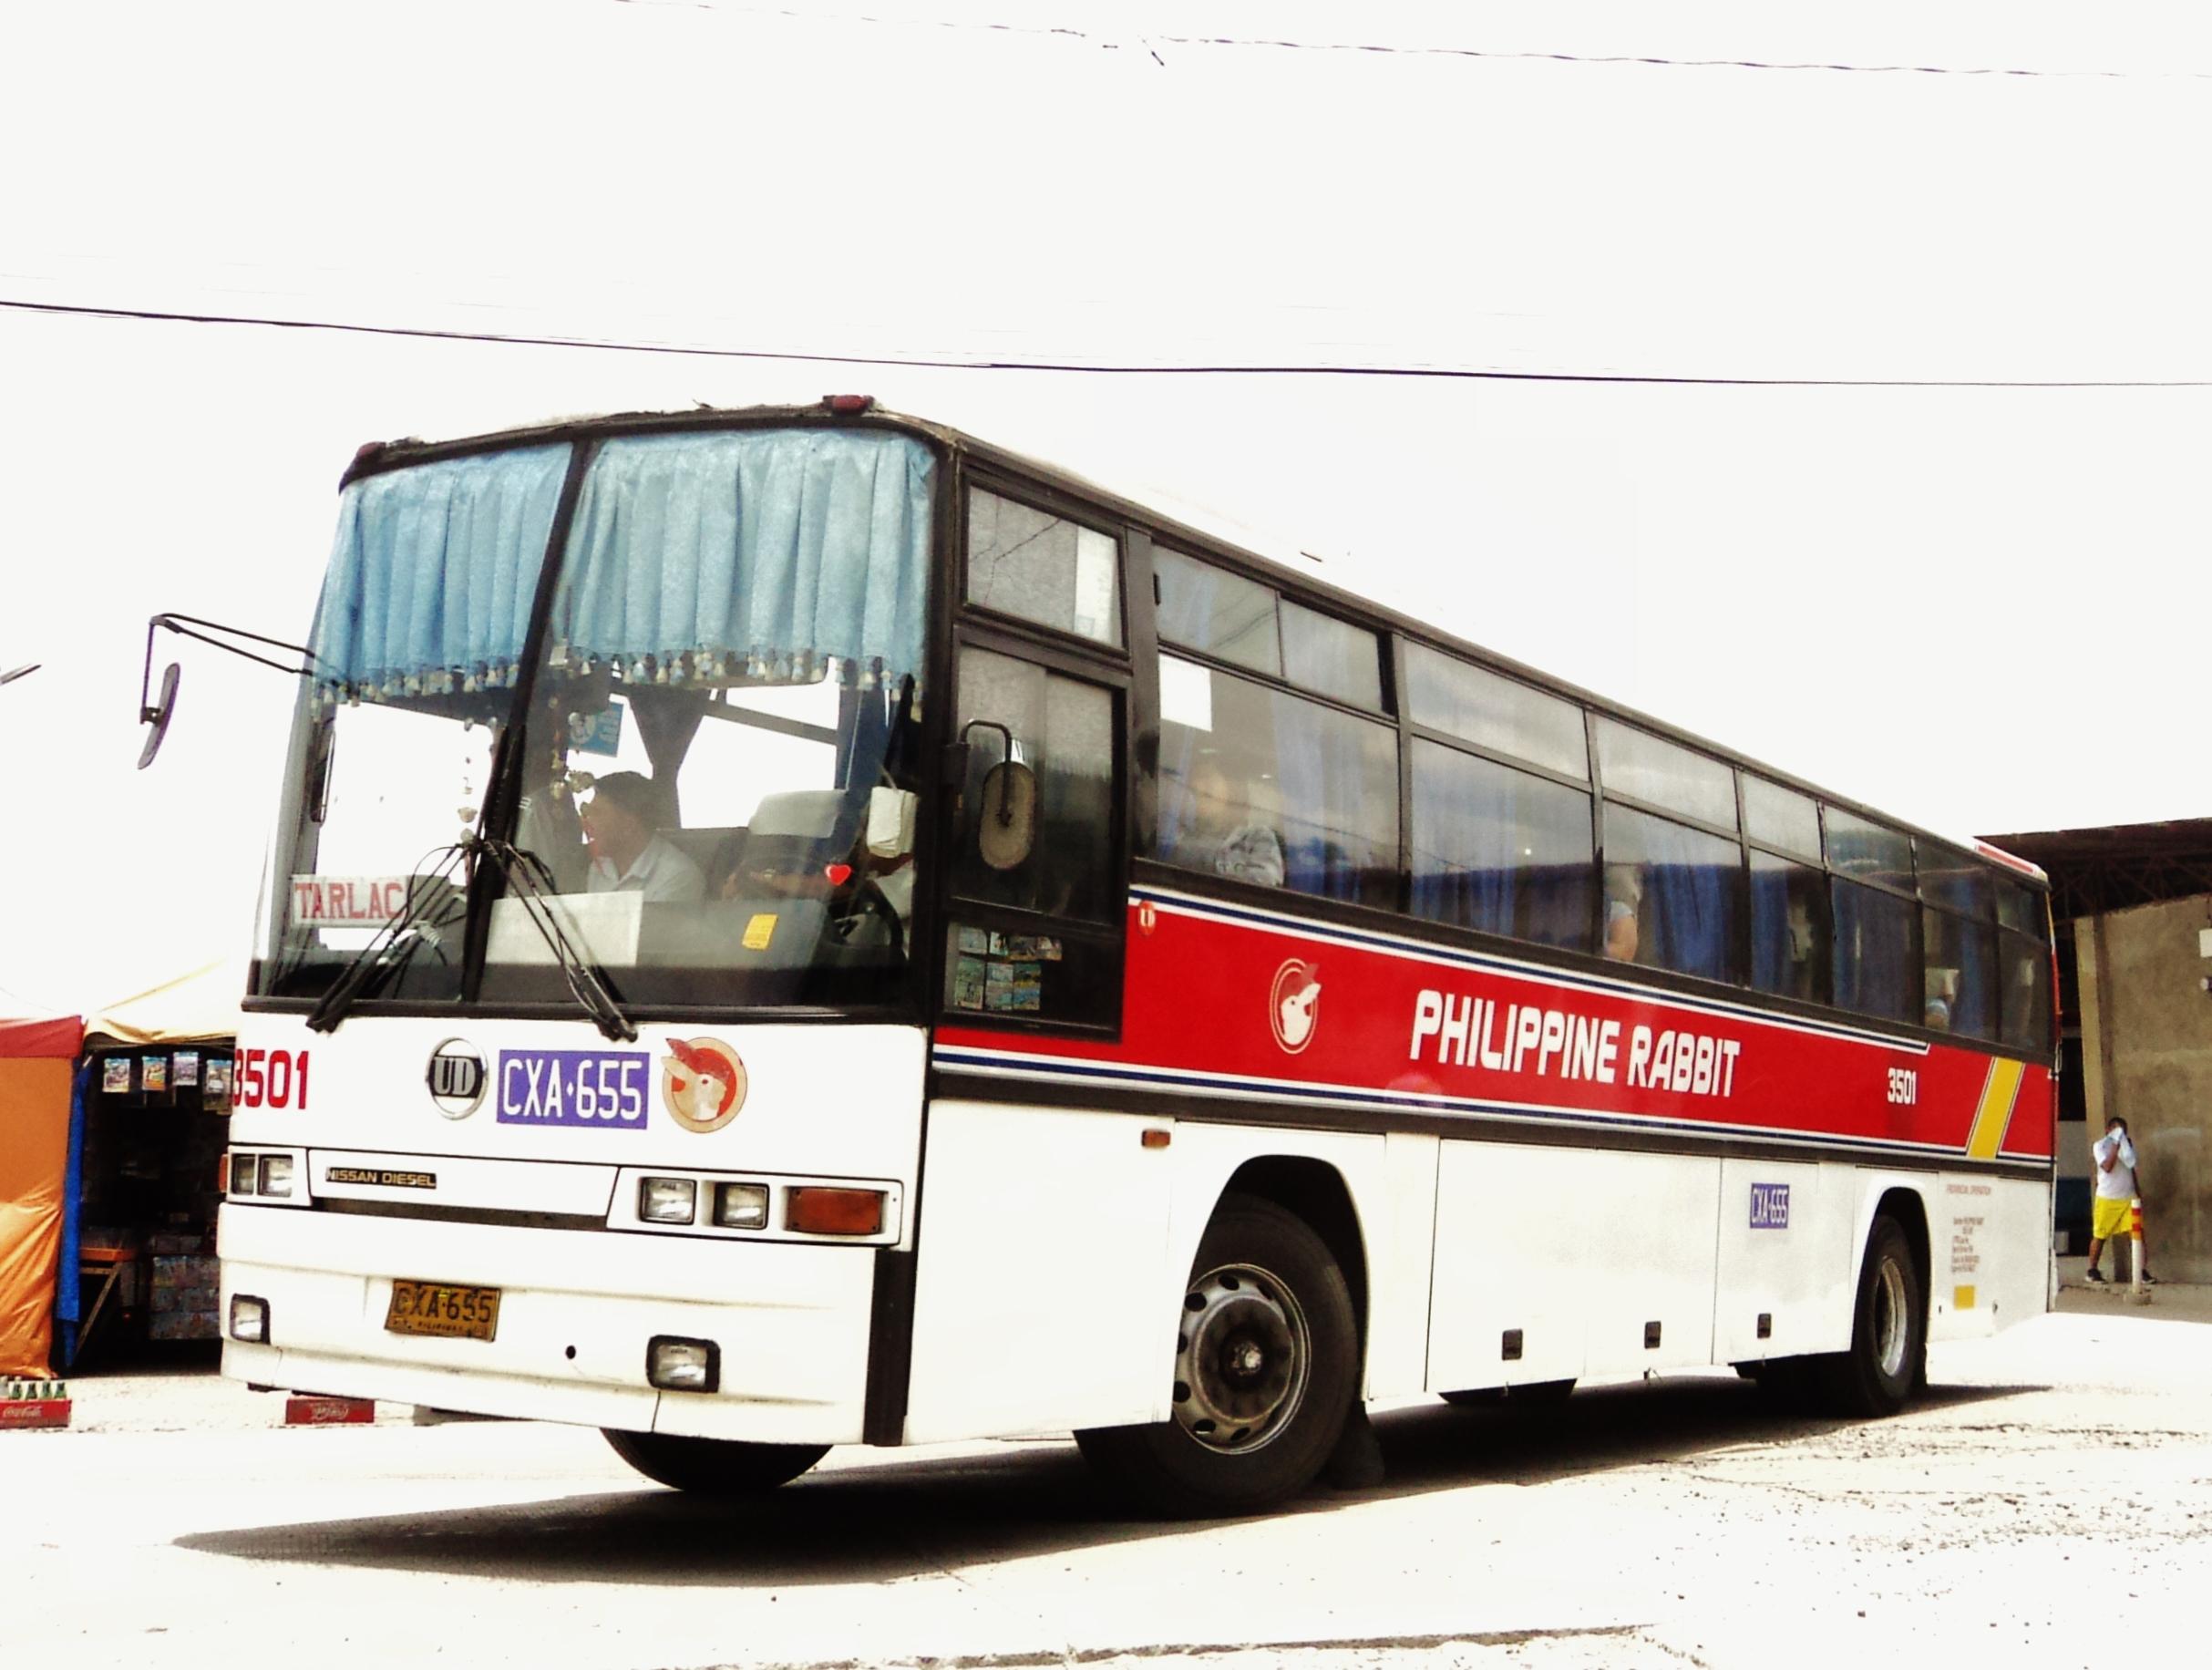 Wonderful Rabbit Nissan Diesel Euro Santarosa Ud Philippine 3501 Prbl Pe6t Rb46sr